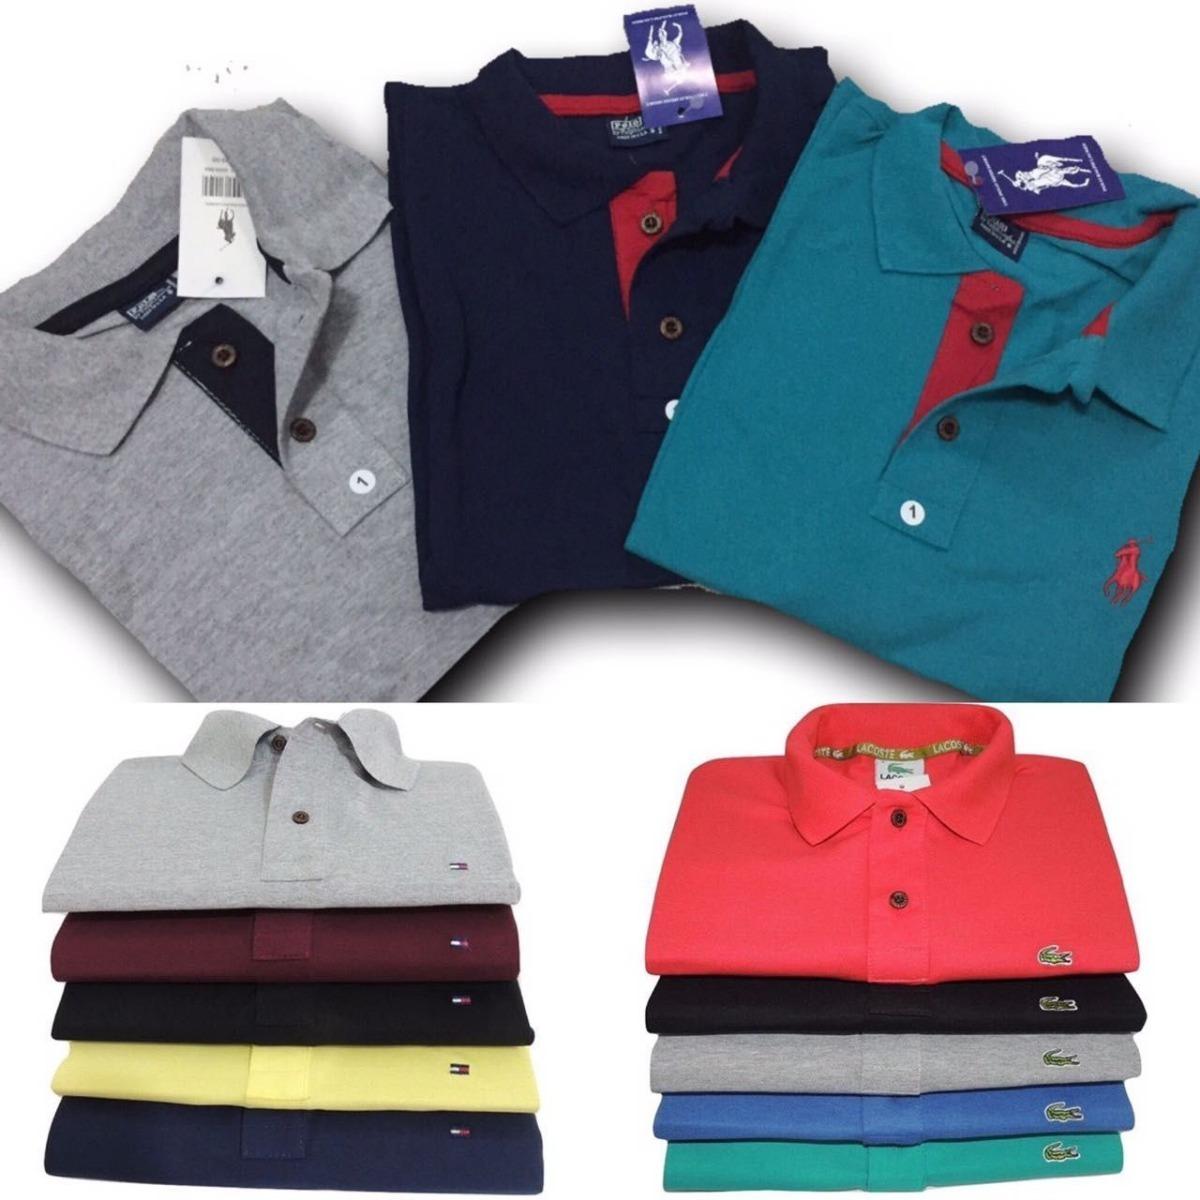 44a018201a5264 ... camisa polo masculina grandes marcas revenda oferta. Carregando  zoom. 0d8142f310d9b